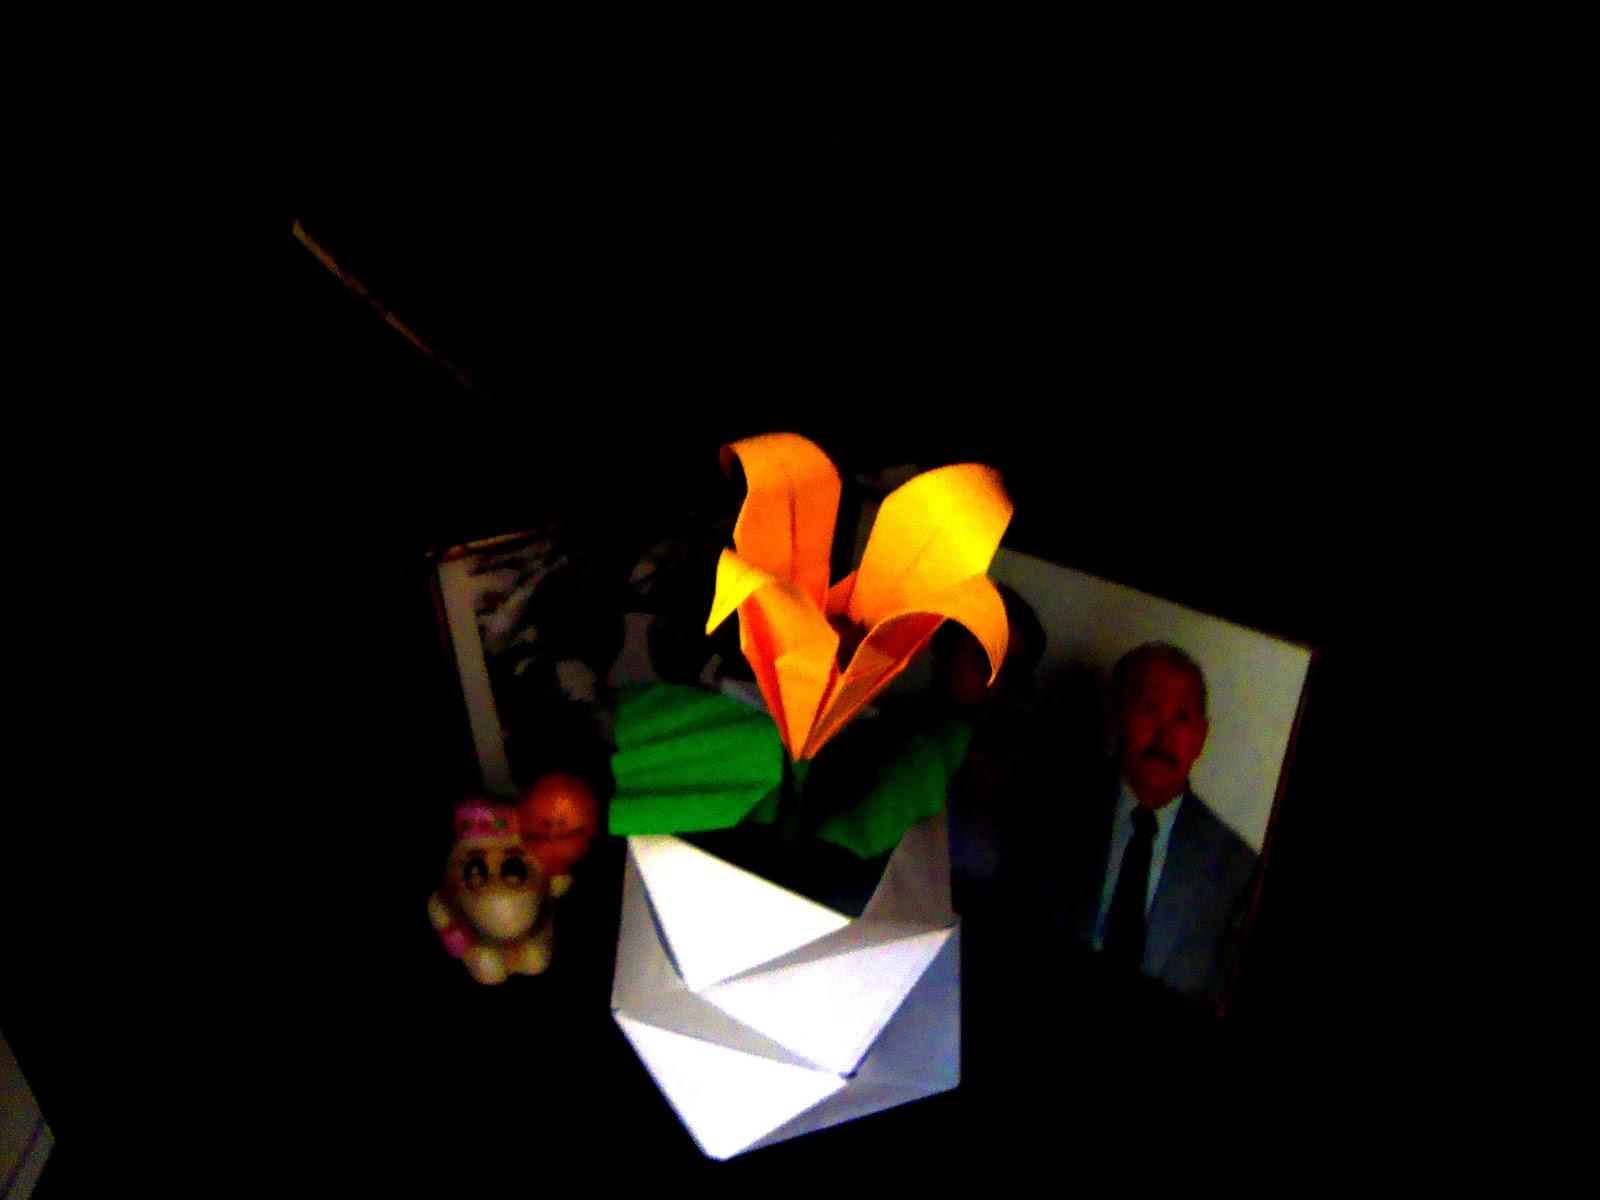 Origami by deuzaaa um dia maravilhoso para todos bjs - Origami para todos ...